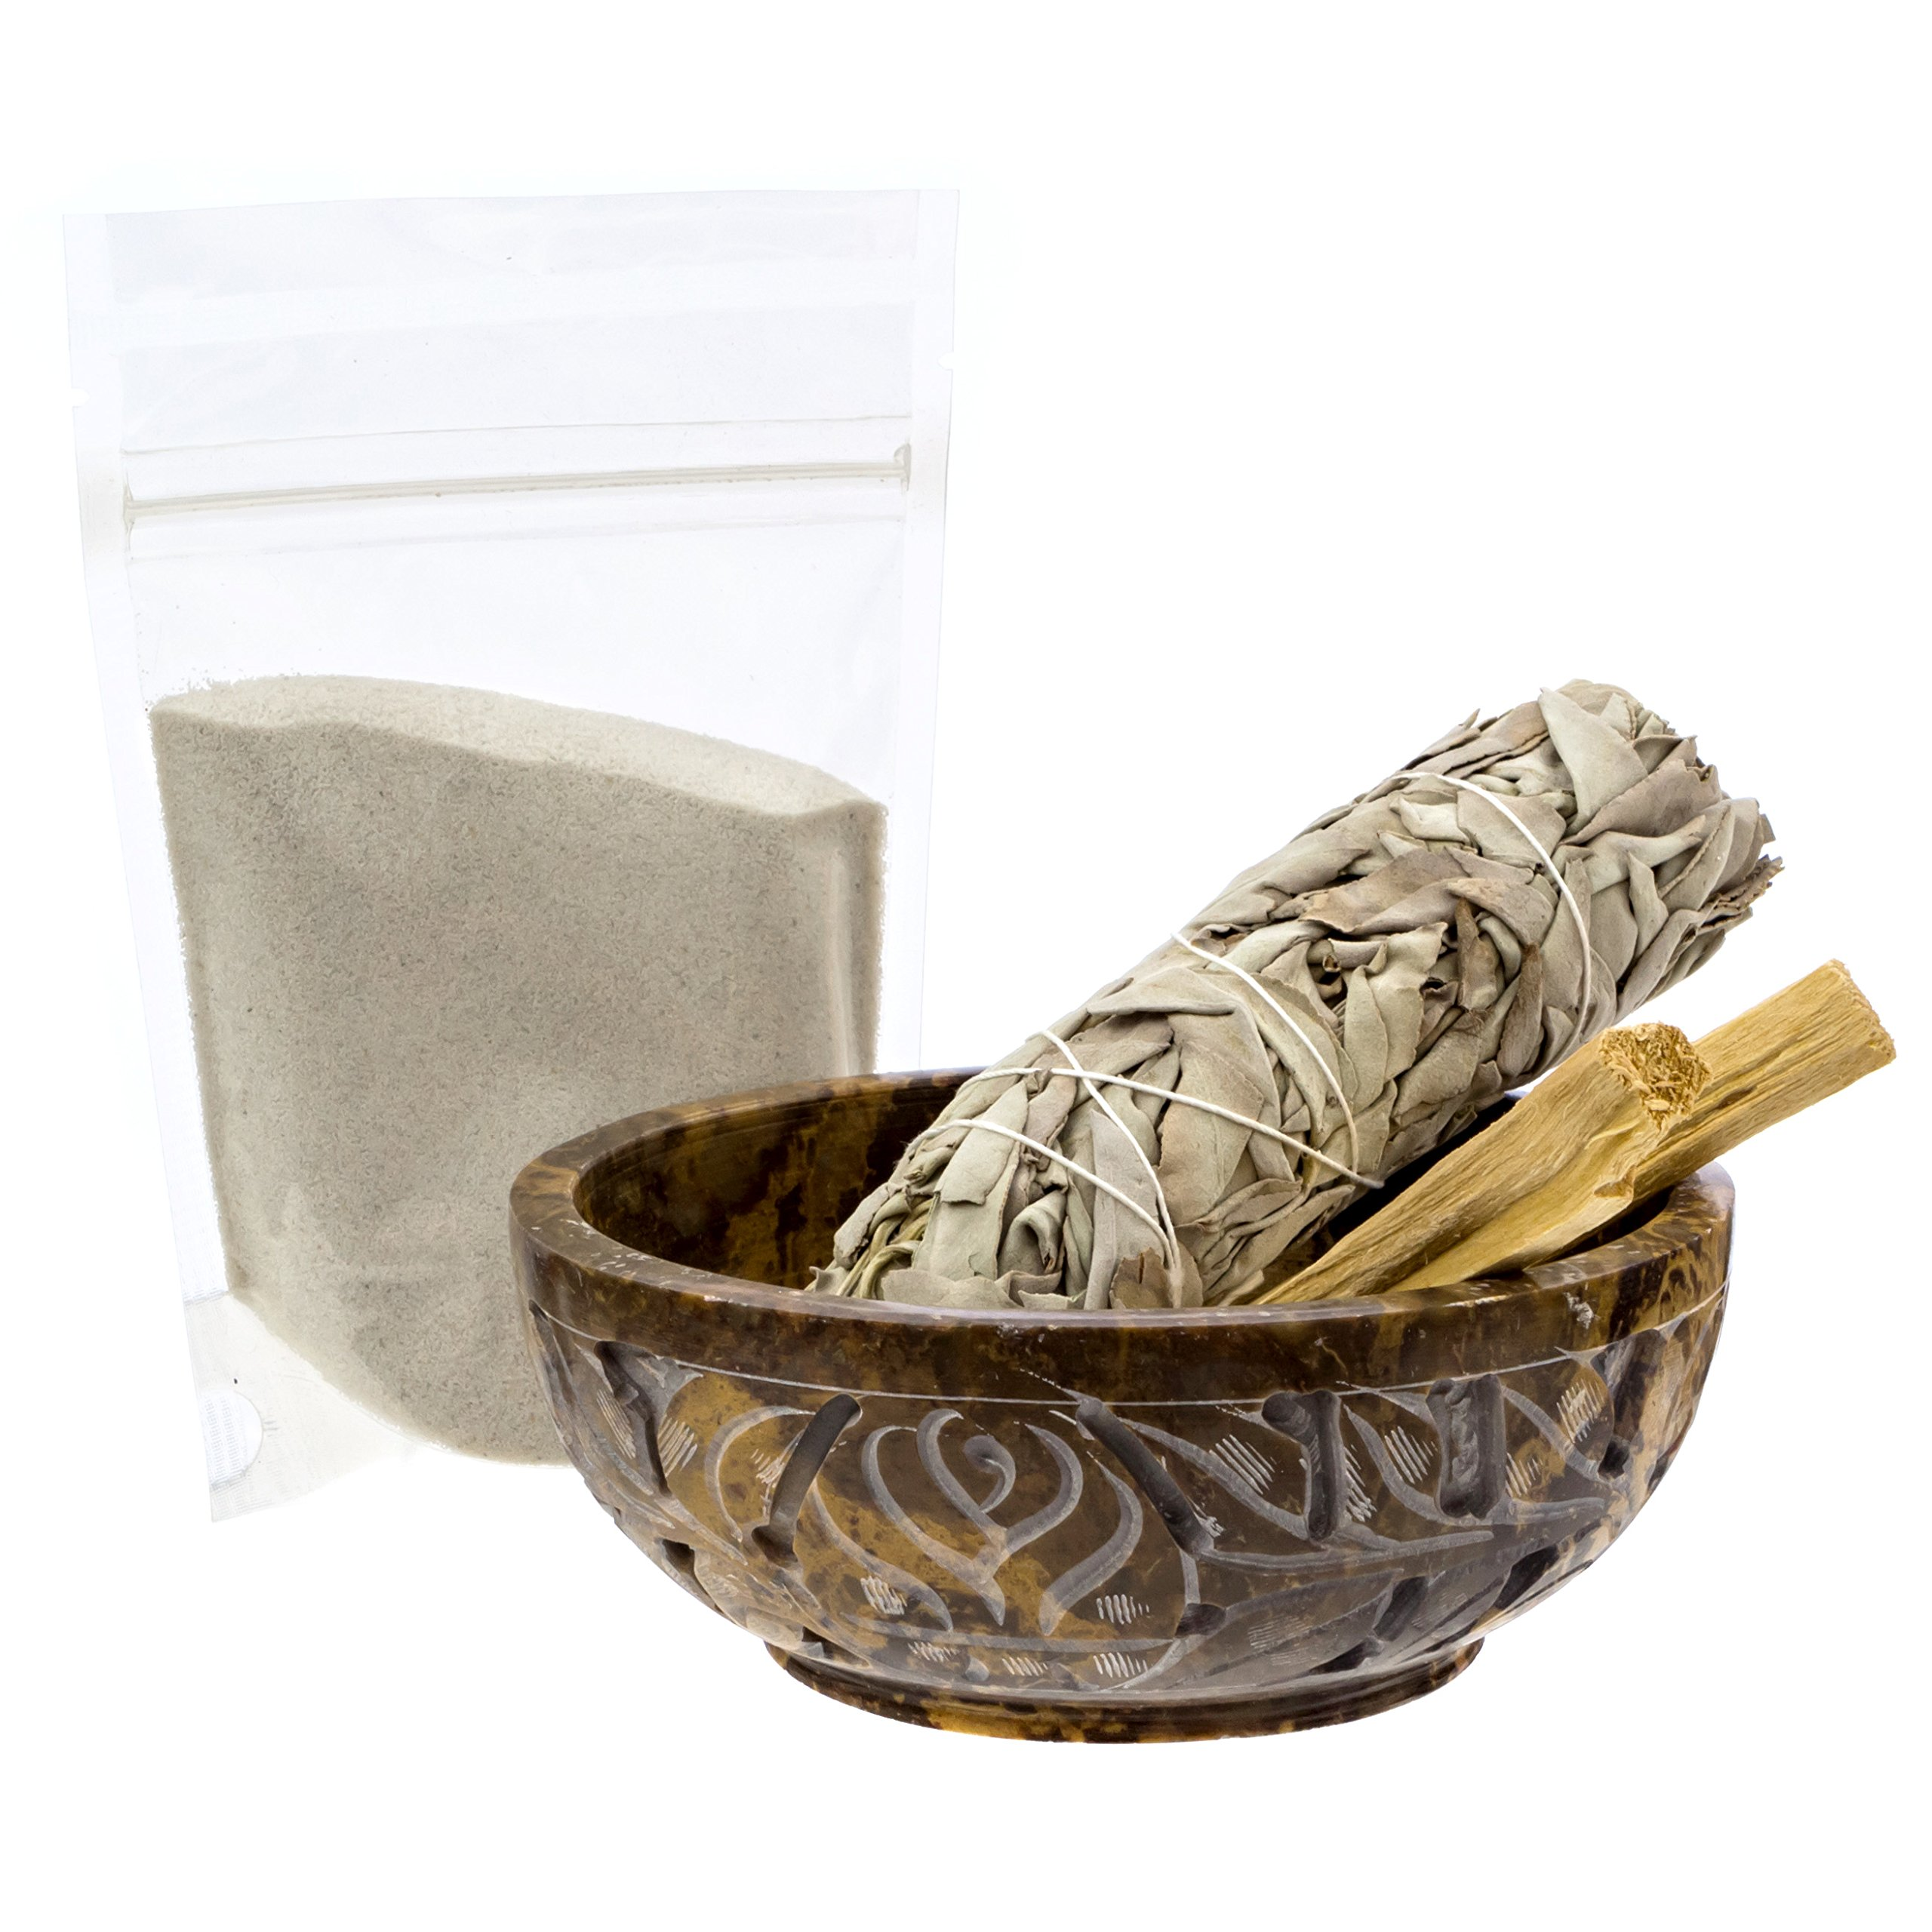 Alternative Imagination Soapstone Smudge Bowl Kit with 1 California White Sage Smudge Stick, 2 Palo Santo Smudge Sticks, and 1/2 lb of White Sand (Deluxe) by Alternative Imagination (Image #2)